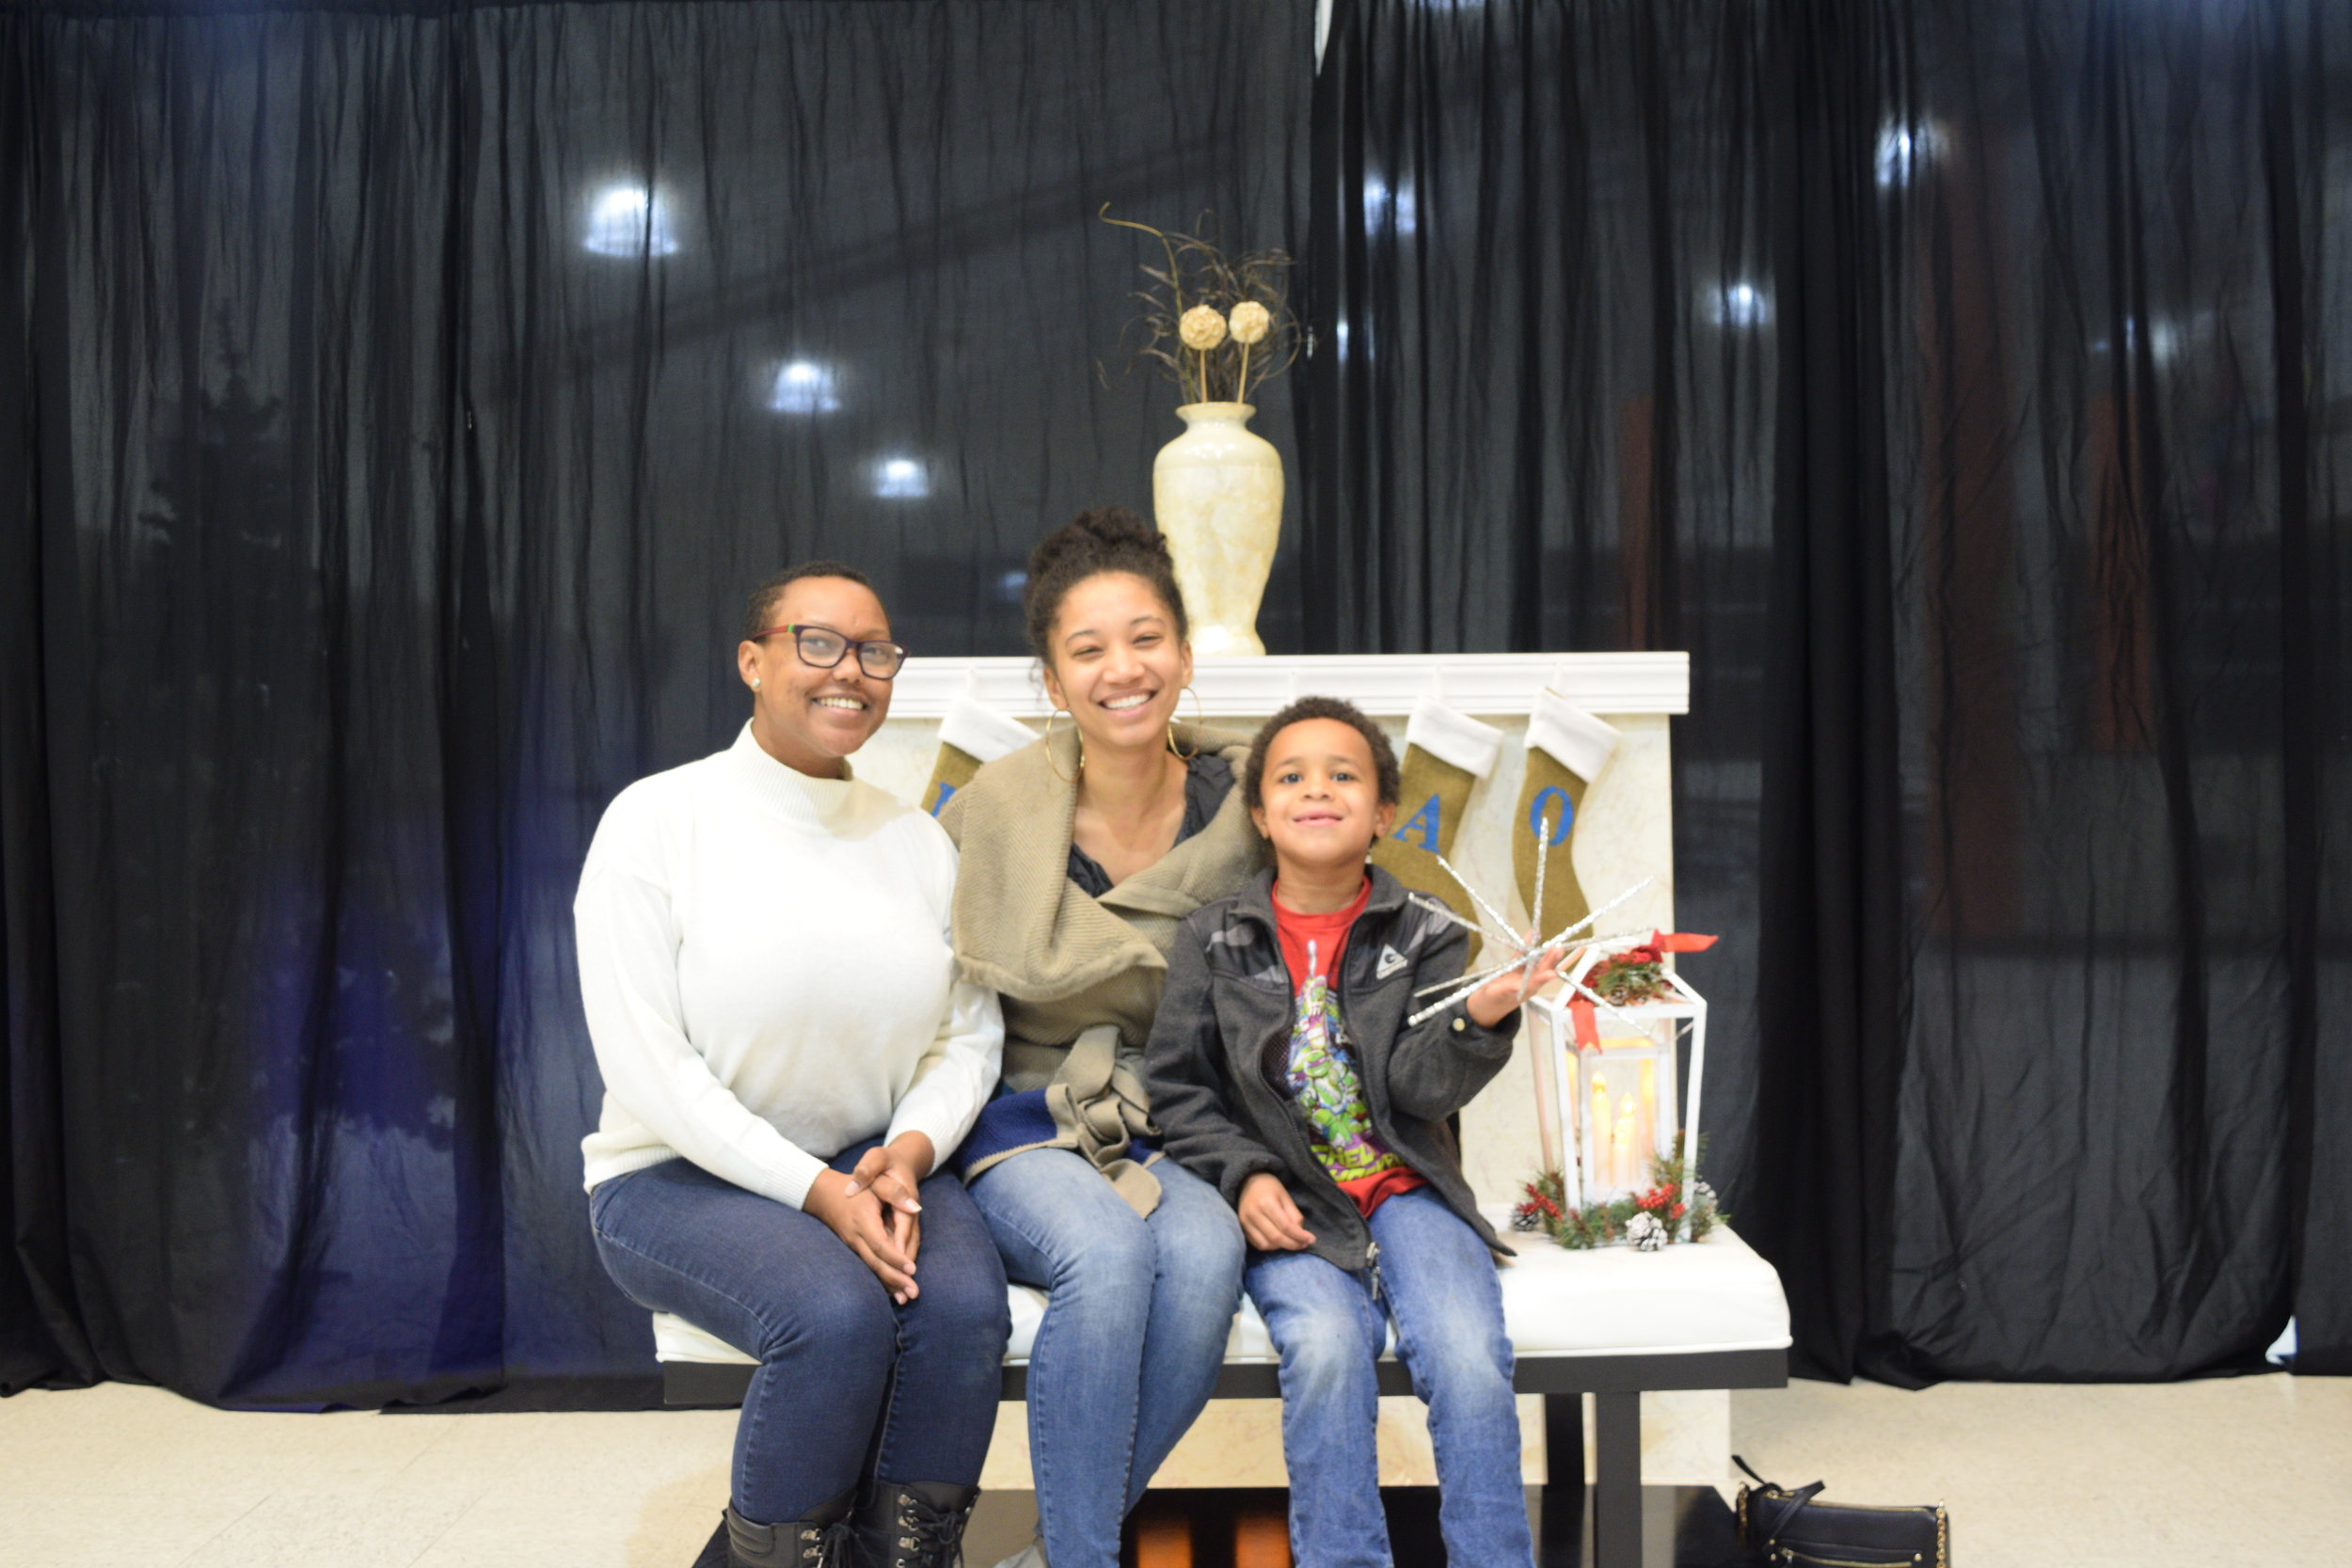 20. Gavin,Desiree C., Juanita Aaron